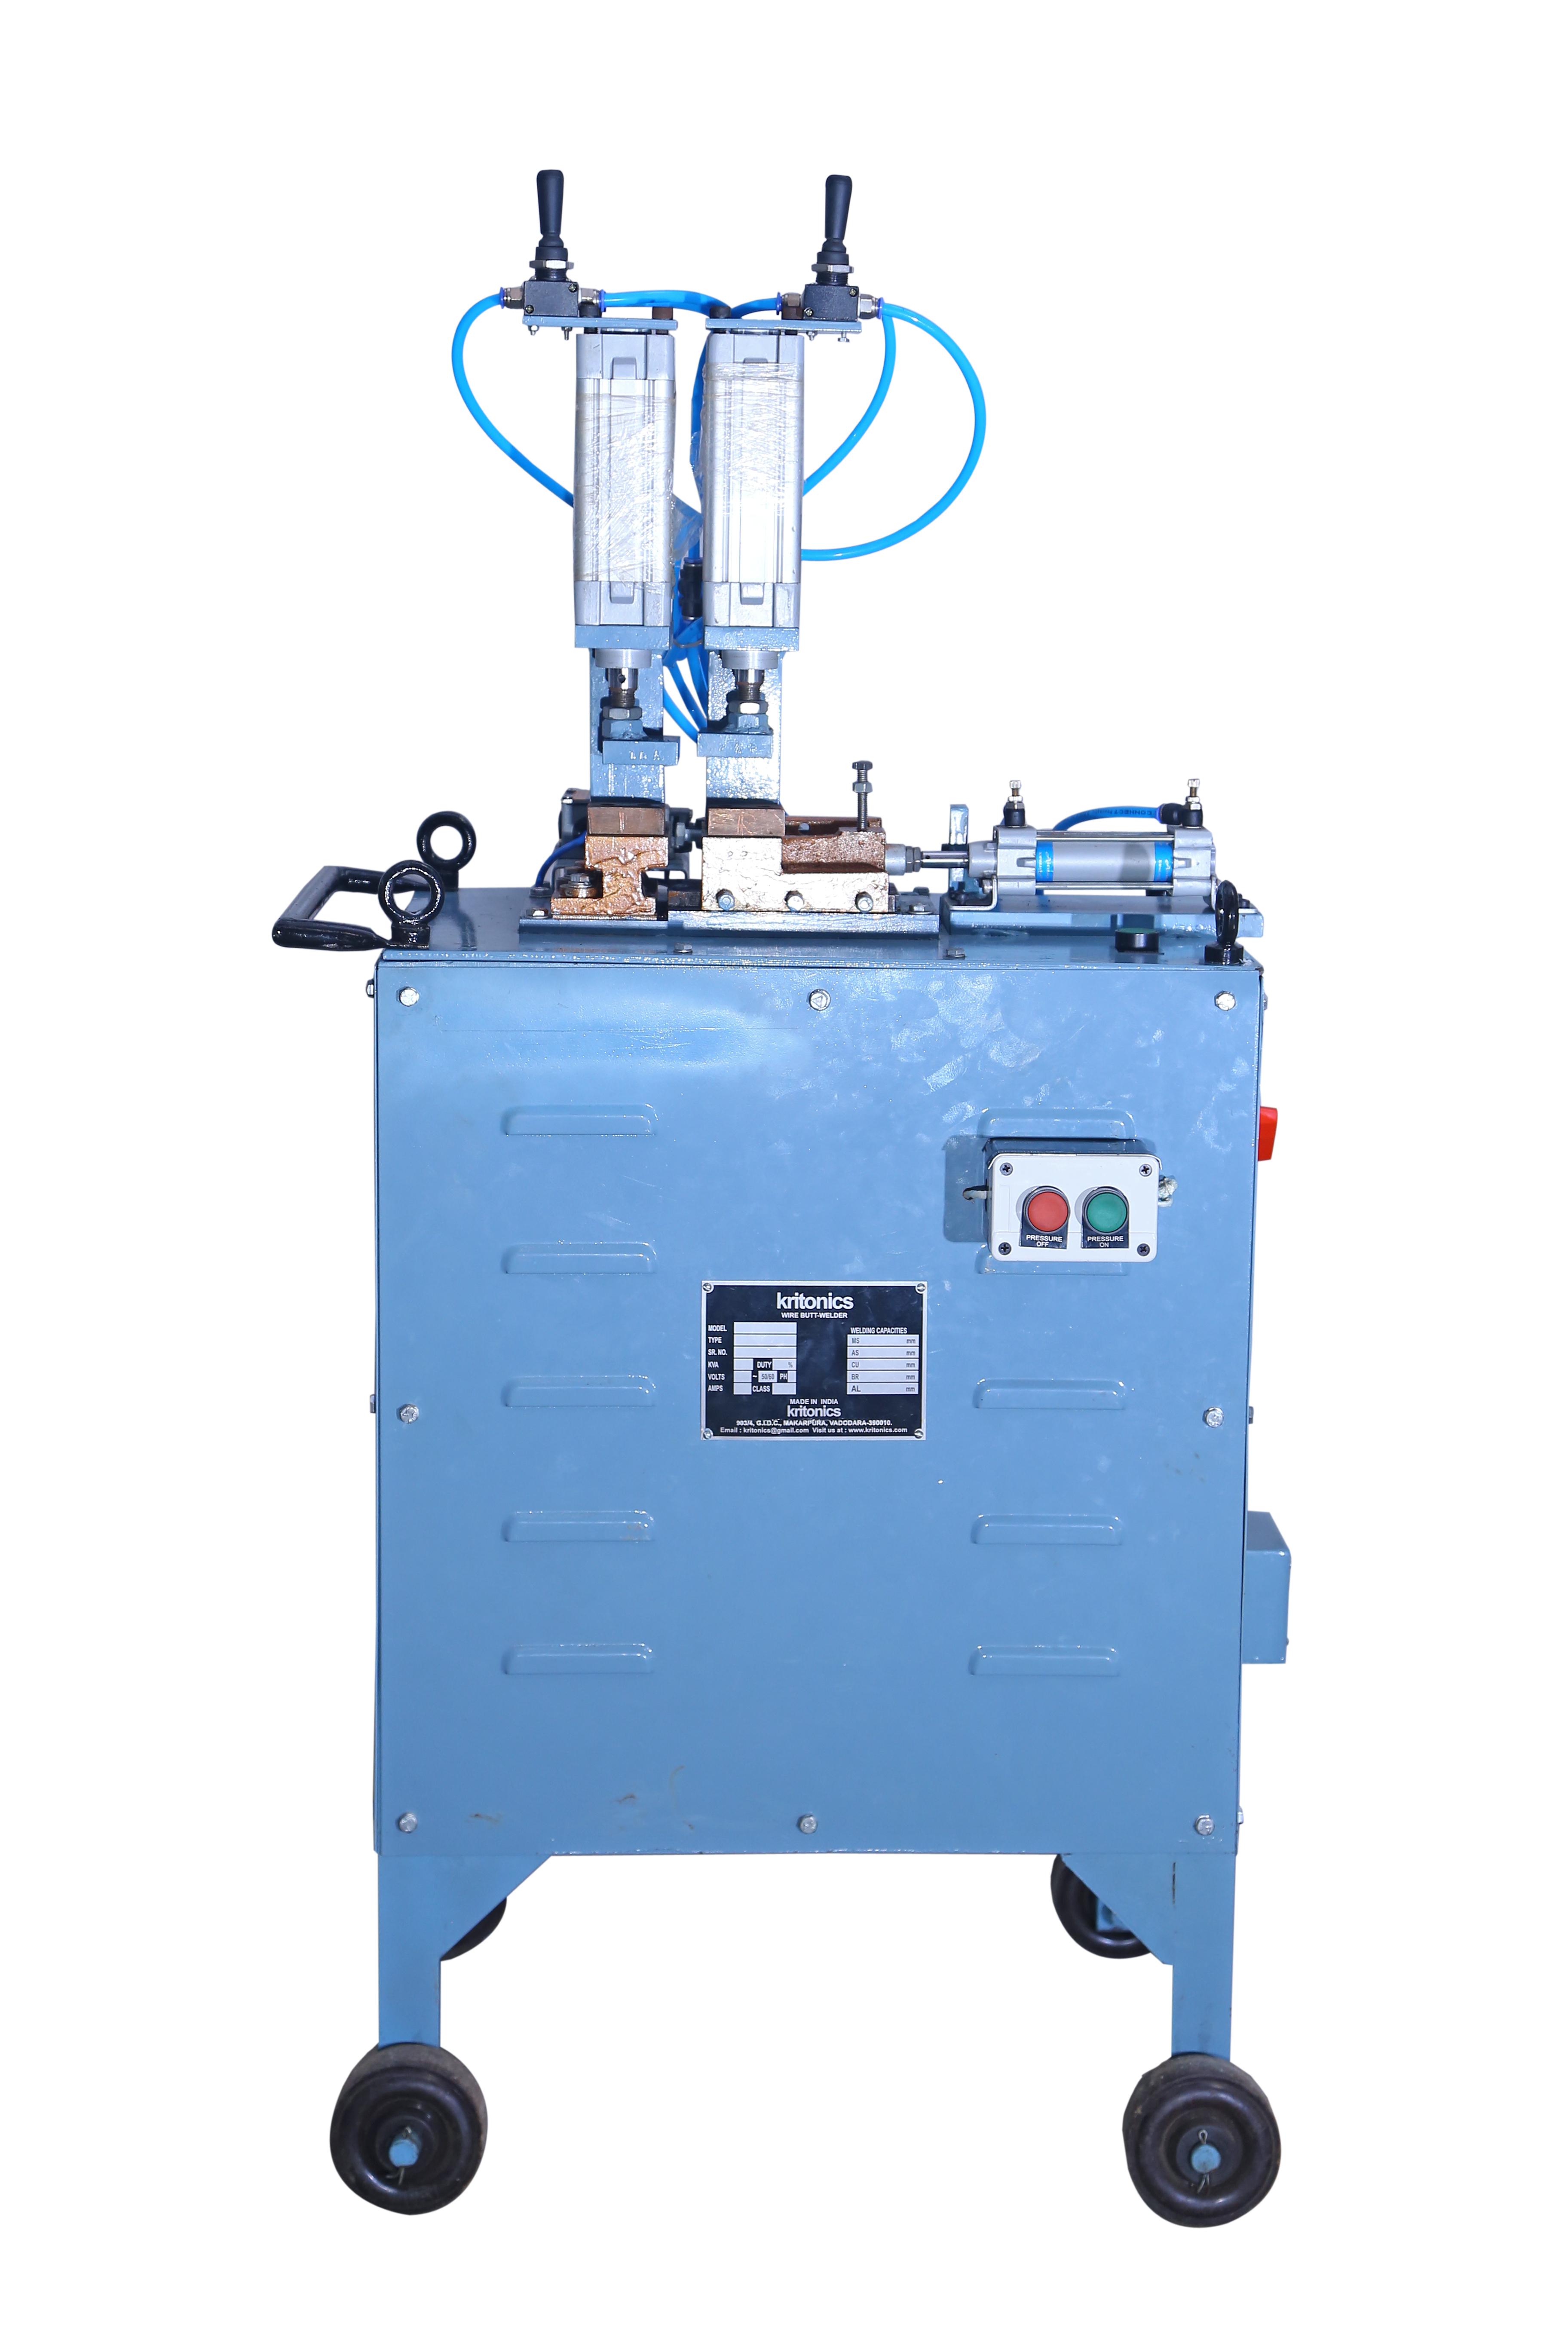 Pneumatic Operated Butt Welding Machine